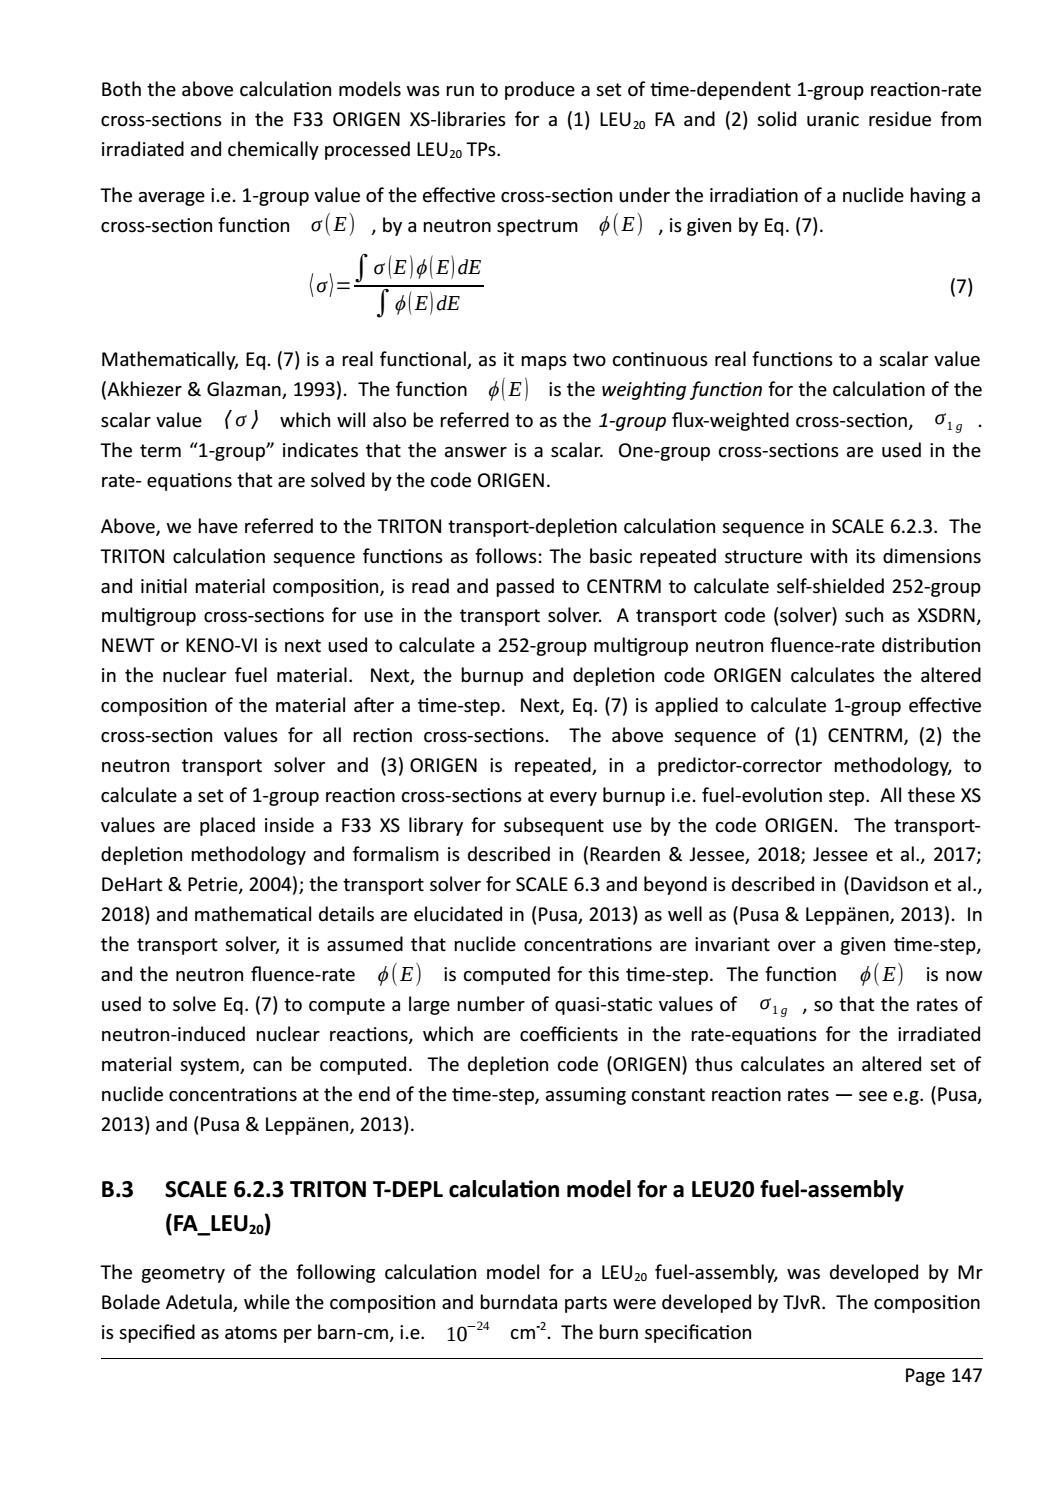 RADIOACTIVE WASTE: COMPUTATIONAL CHARACTERISATION and SHIELDING page 172